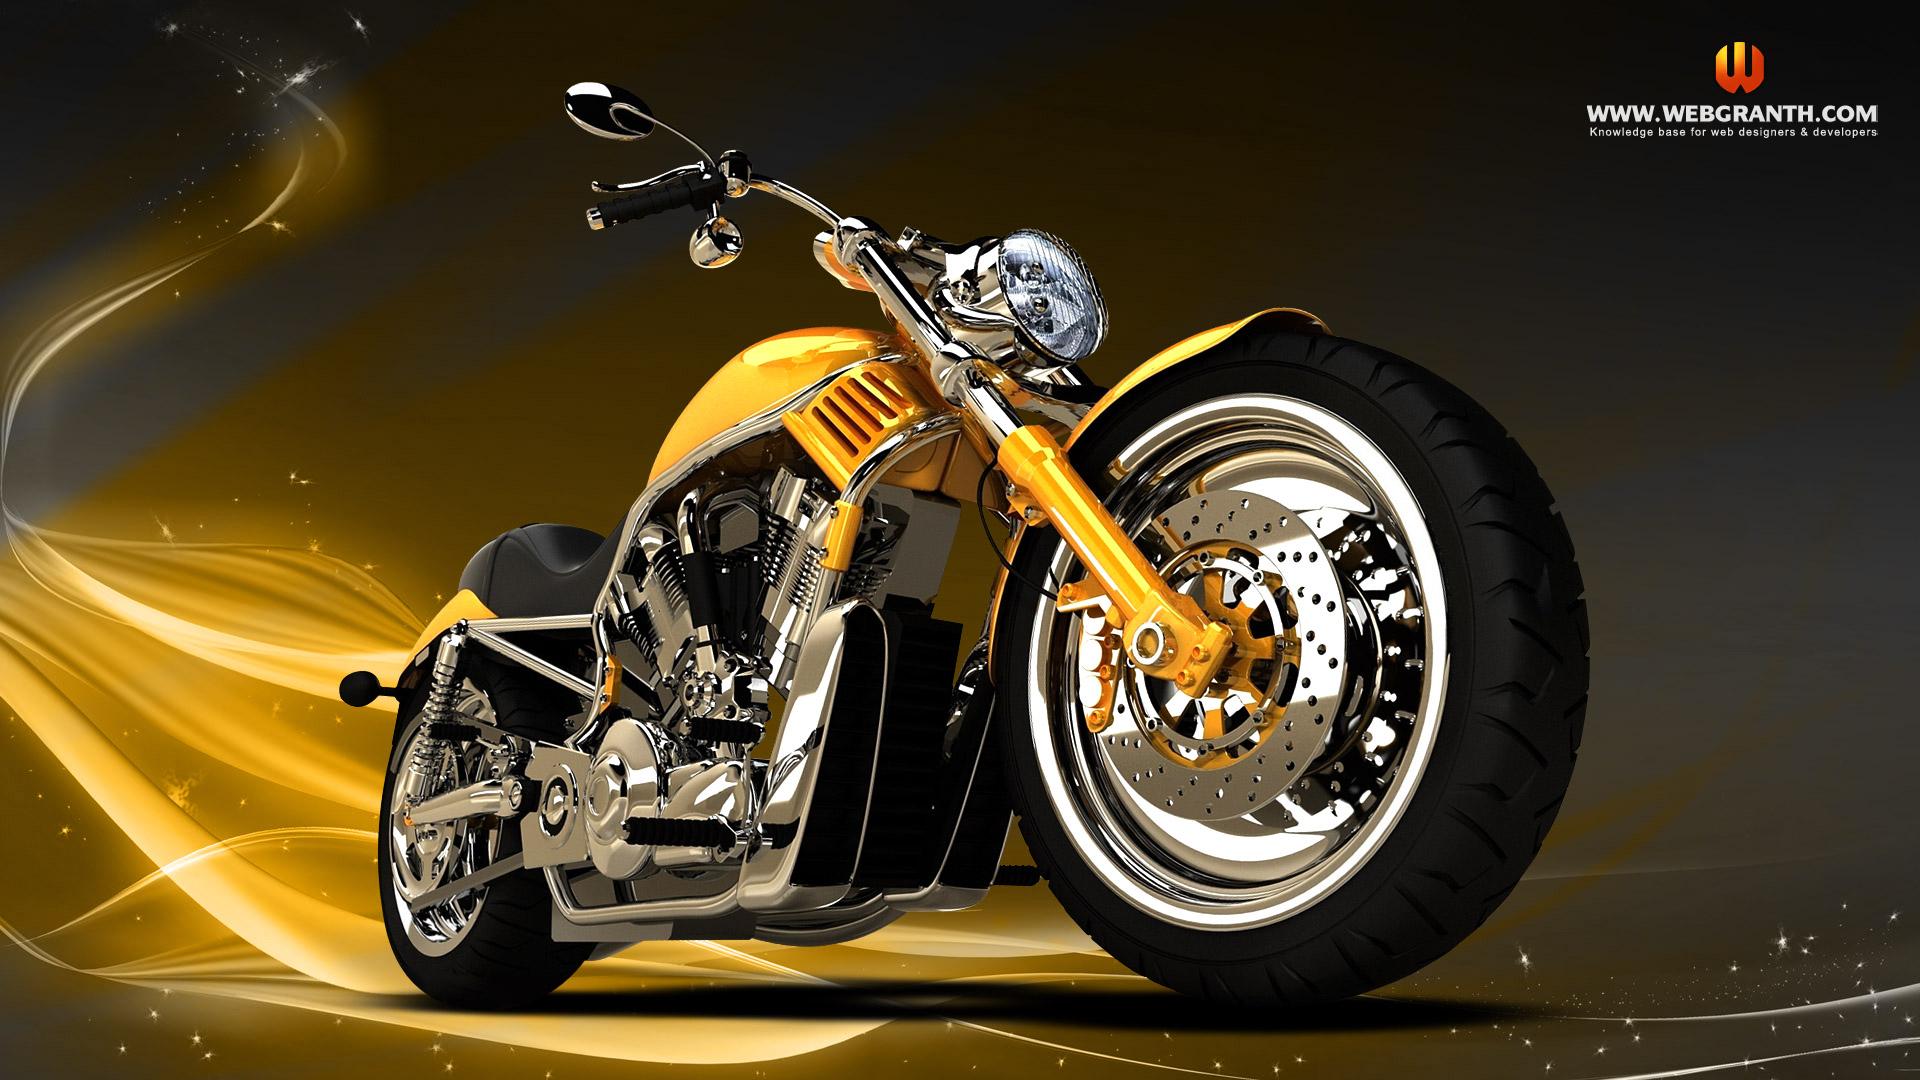 American Chopper Bikes Wallpapers wwwgalleryhipcom 1920x1080